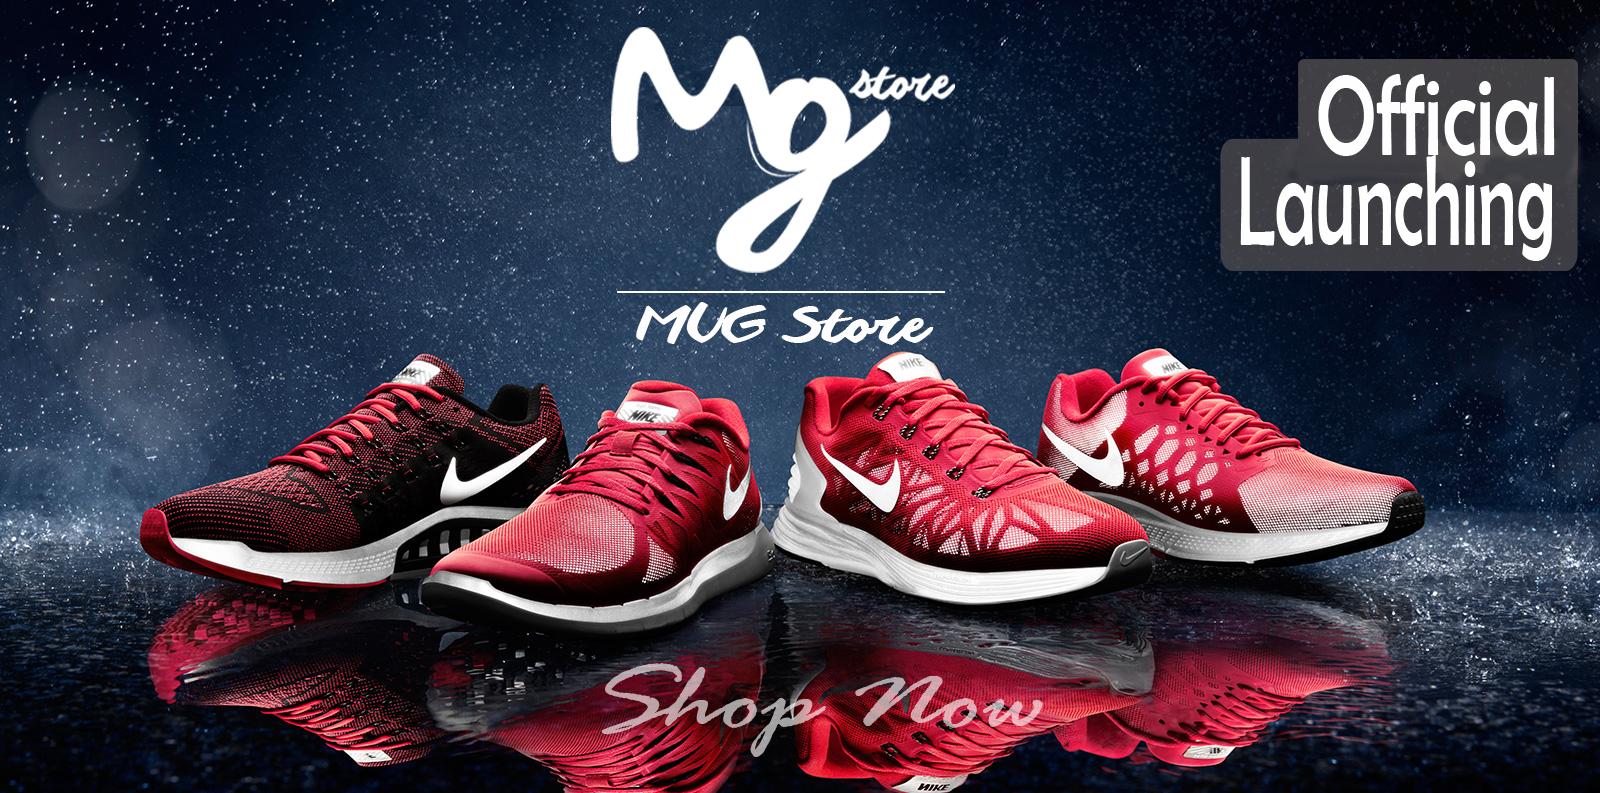 finest selection 82e83 21fc8 promo code for jual sepatu nike flyknit air max murah jakarta 12ecd 2a969